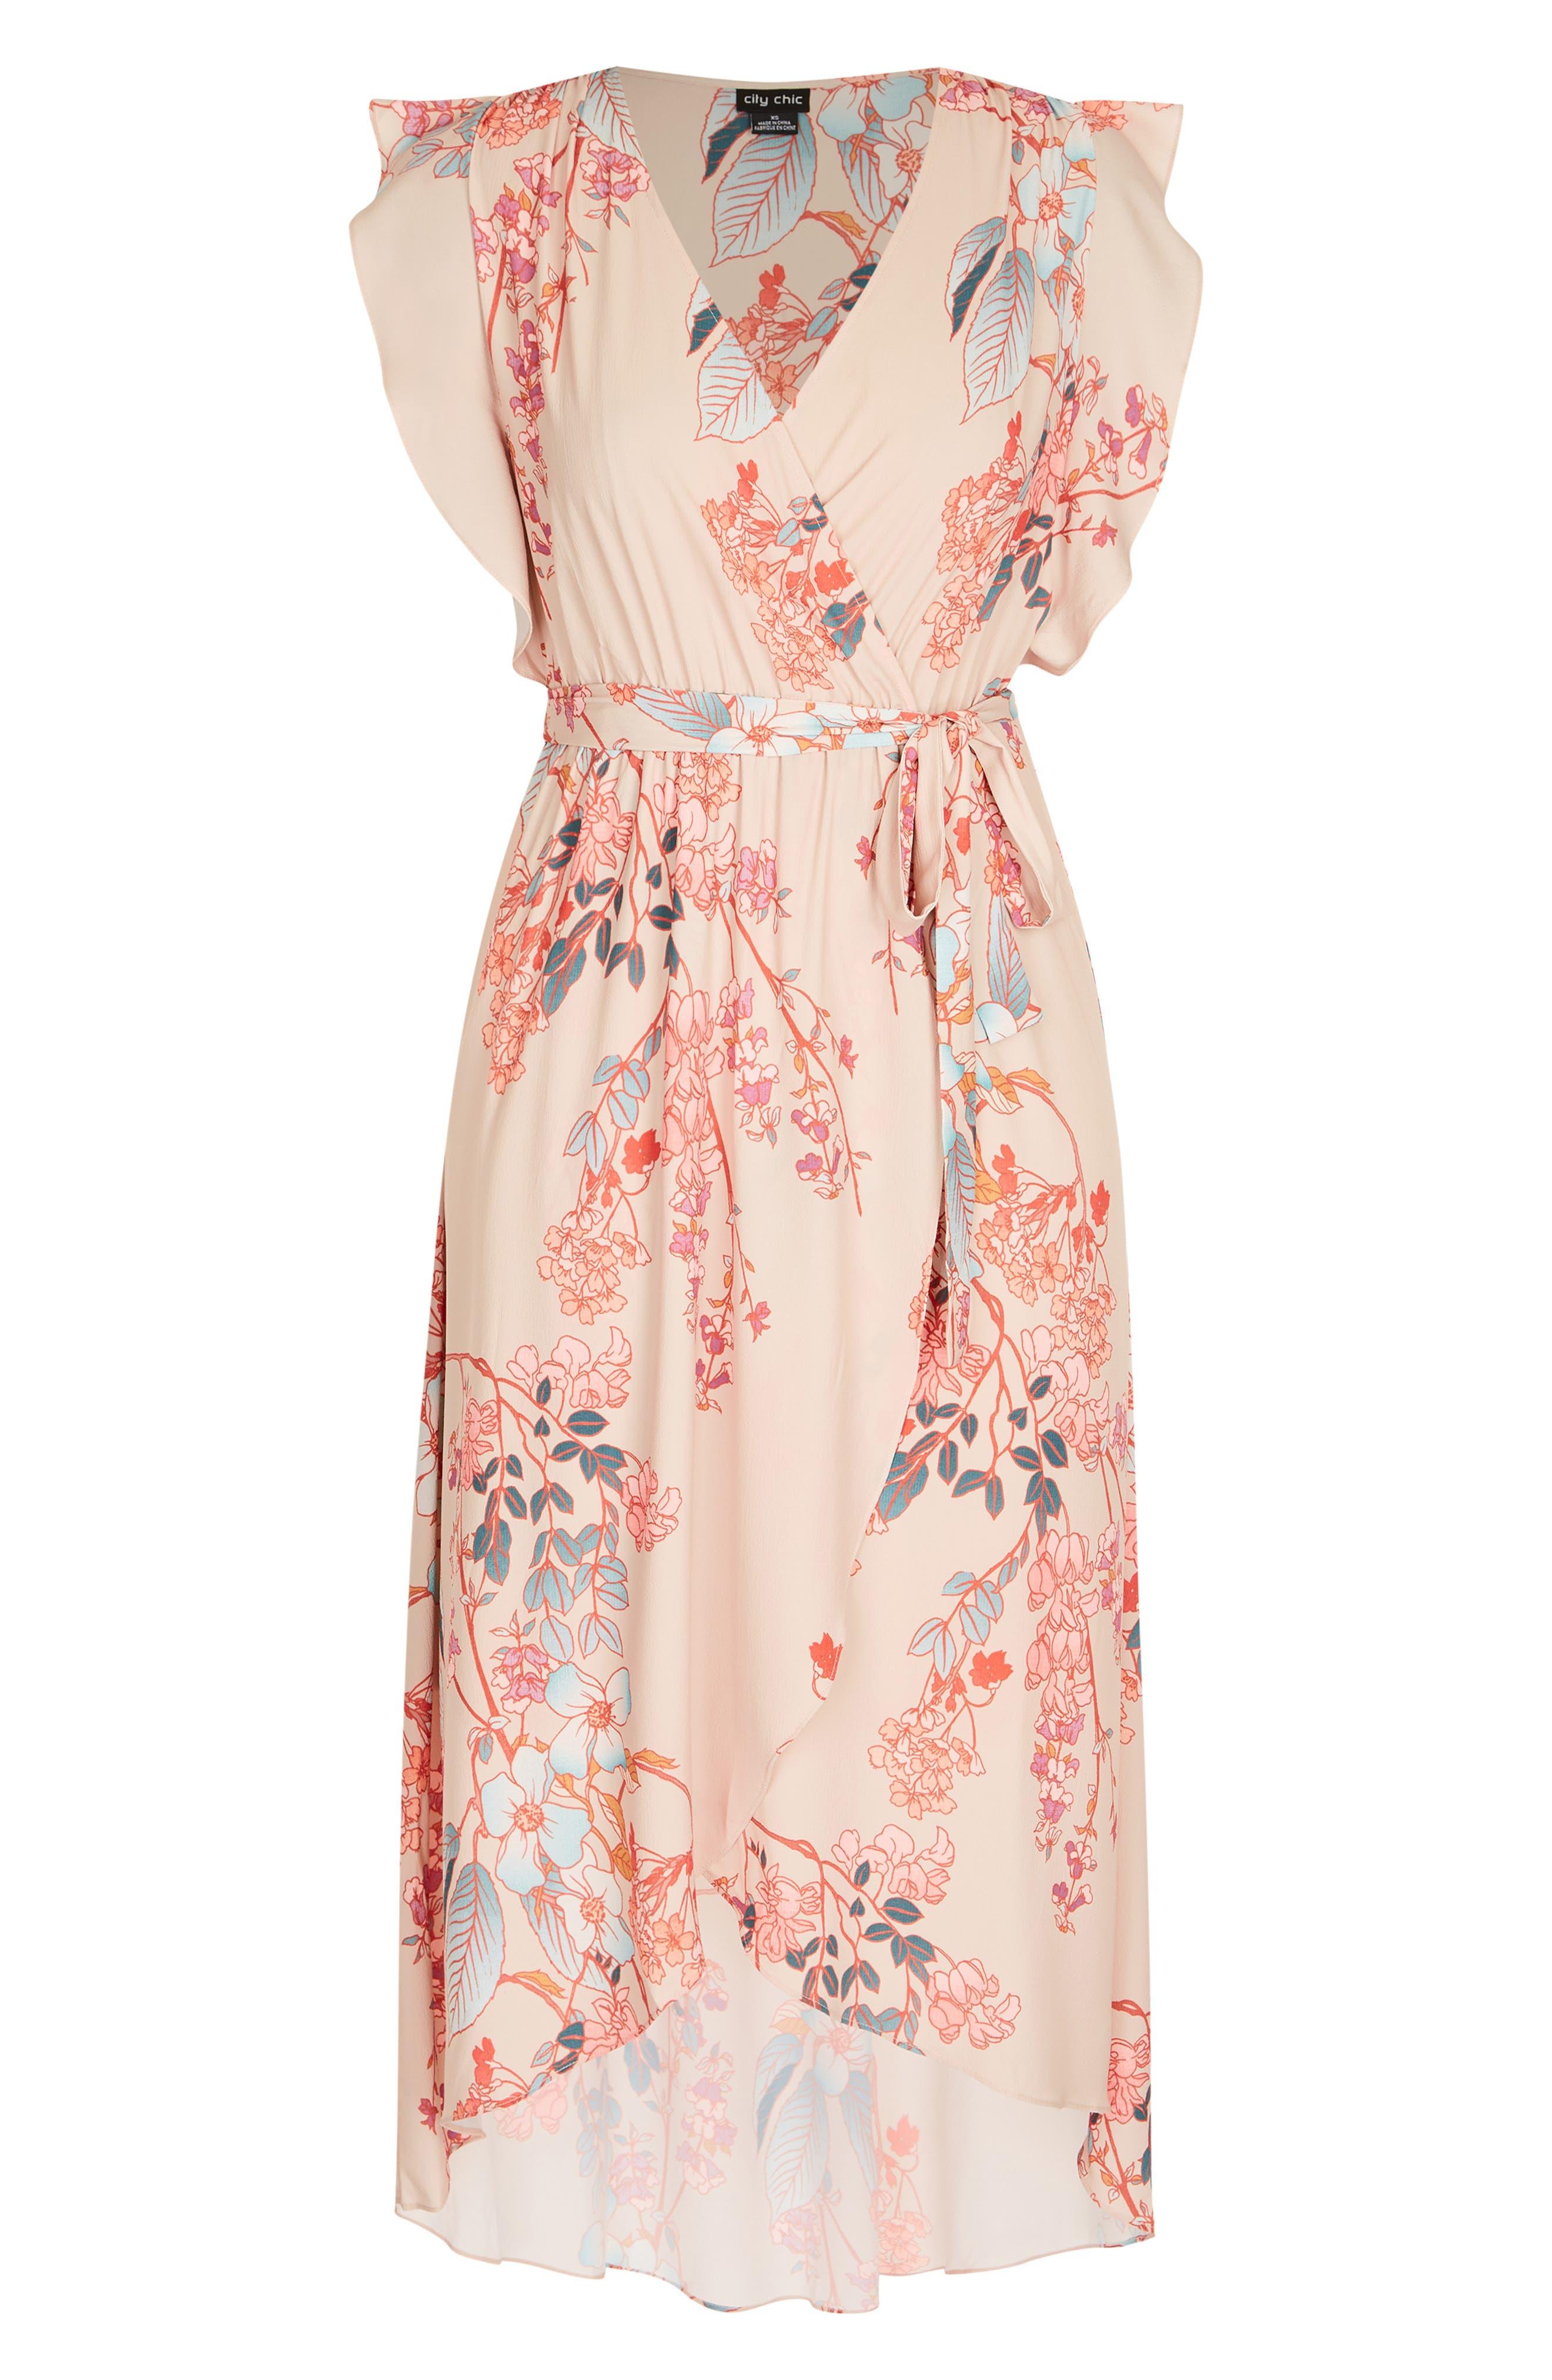 CITY CHIC,                             Sweet Delilah Faux Wrap Maxi Dress,                             Alternate thumbnail 3, color,                             SWEET DELILAH